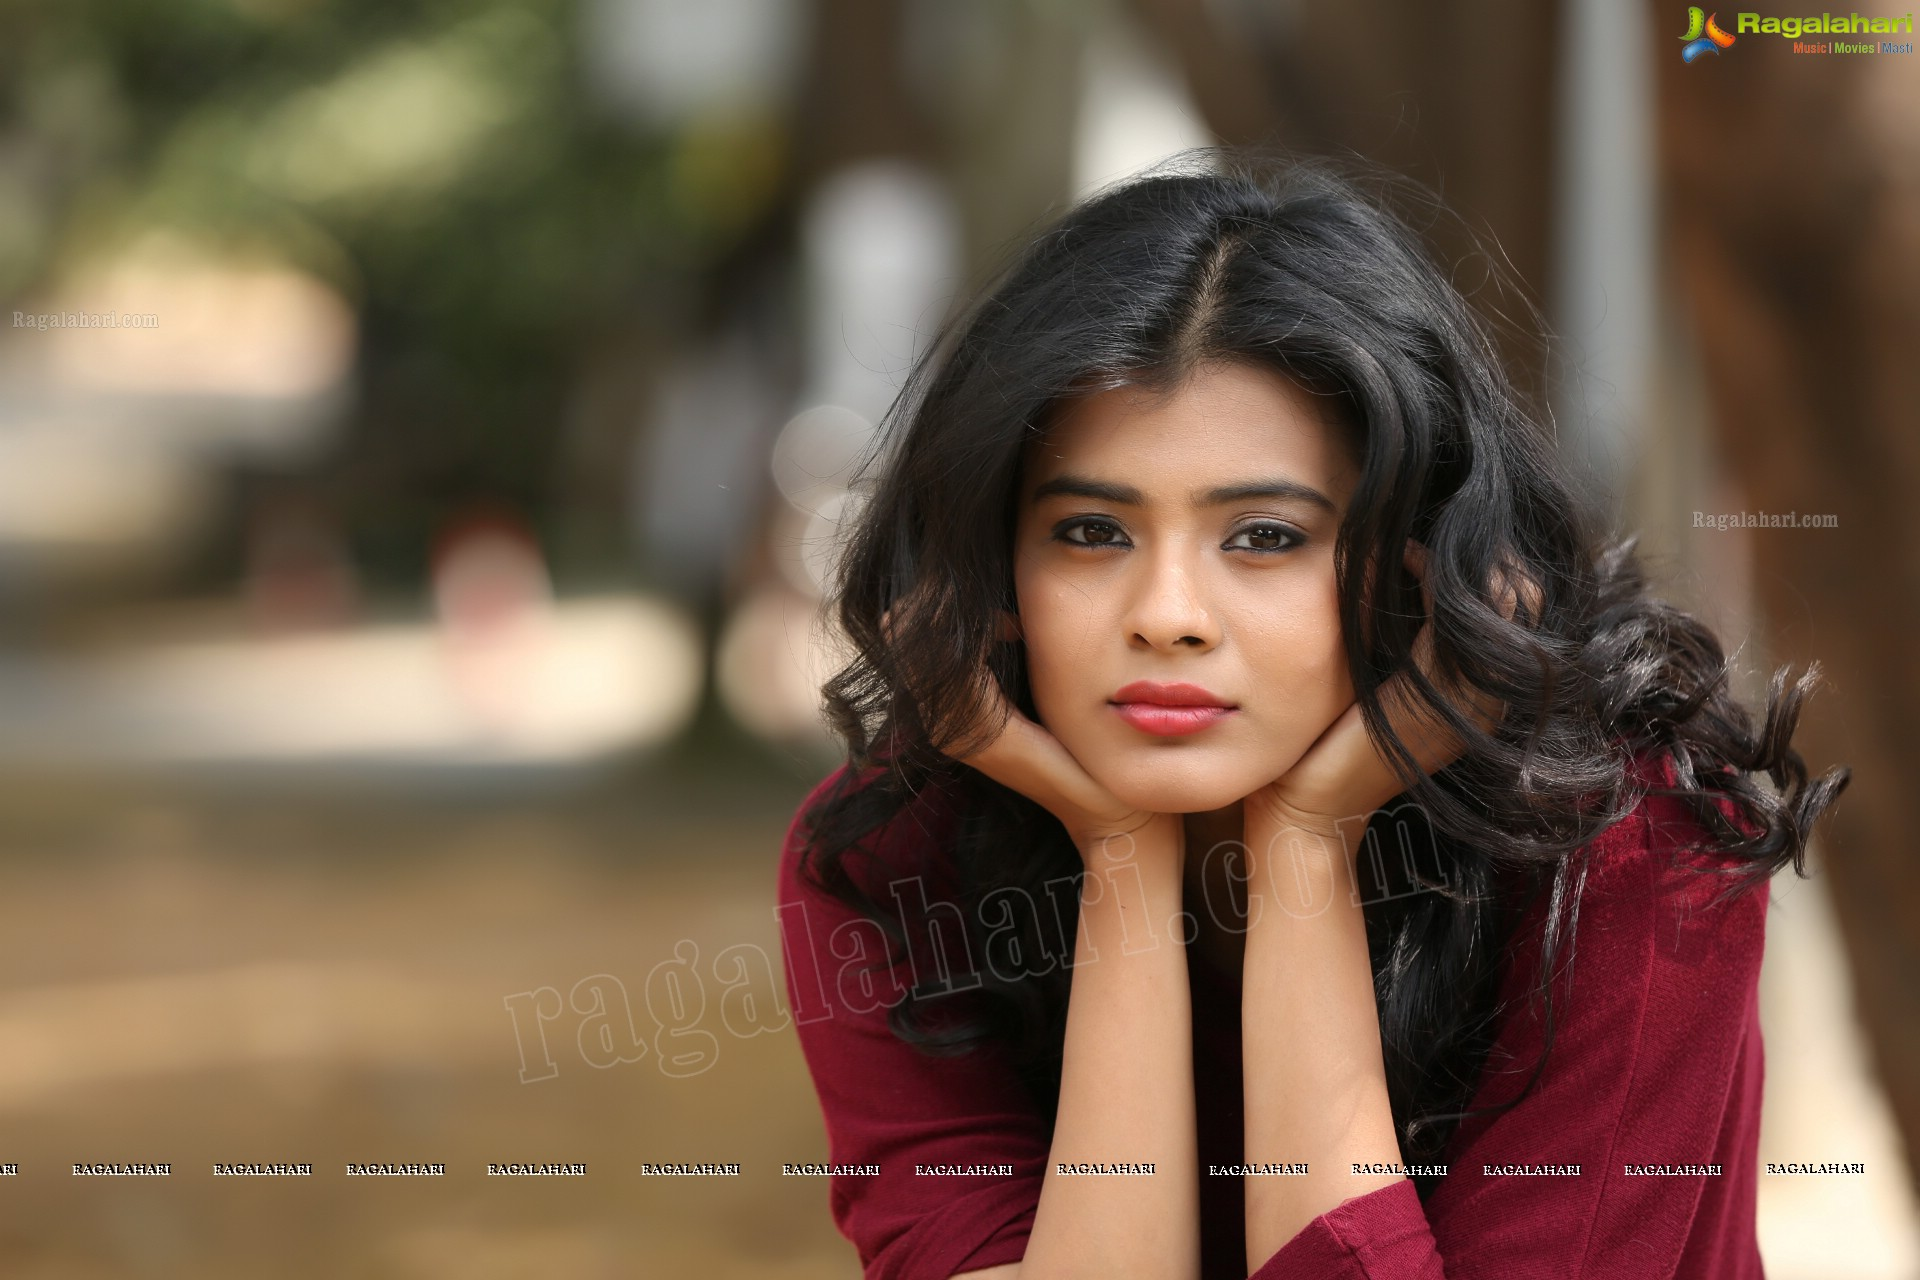 Hebah patel images 2 - Hebah Patel Exclusive High Definition Image 2 Tollywood Heroines Stills Stills Heroines Hot Actress Photos